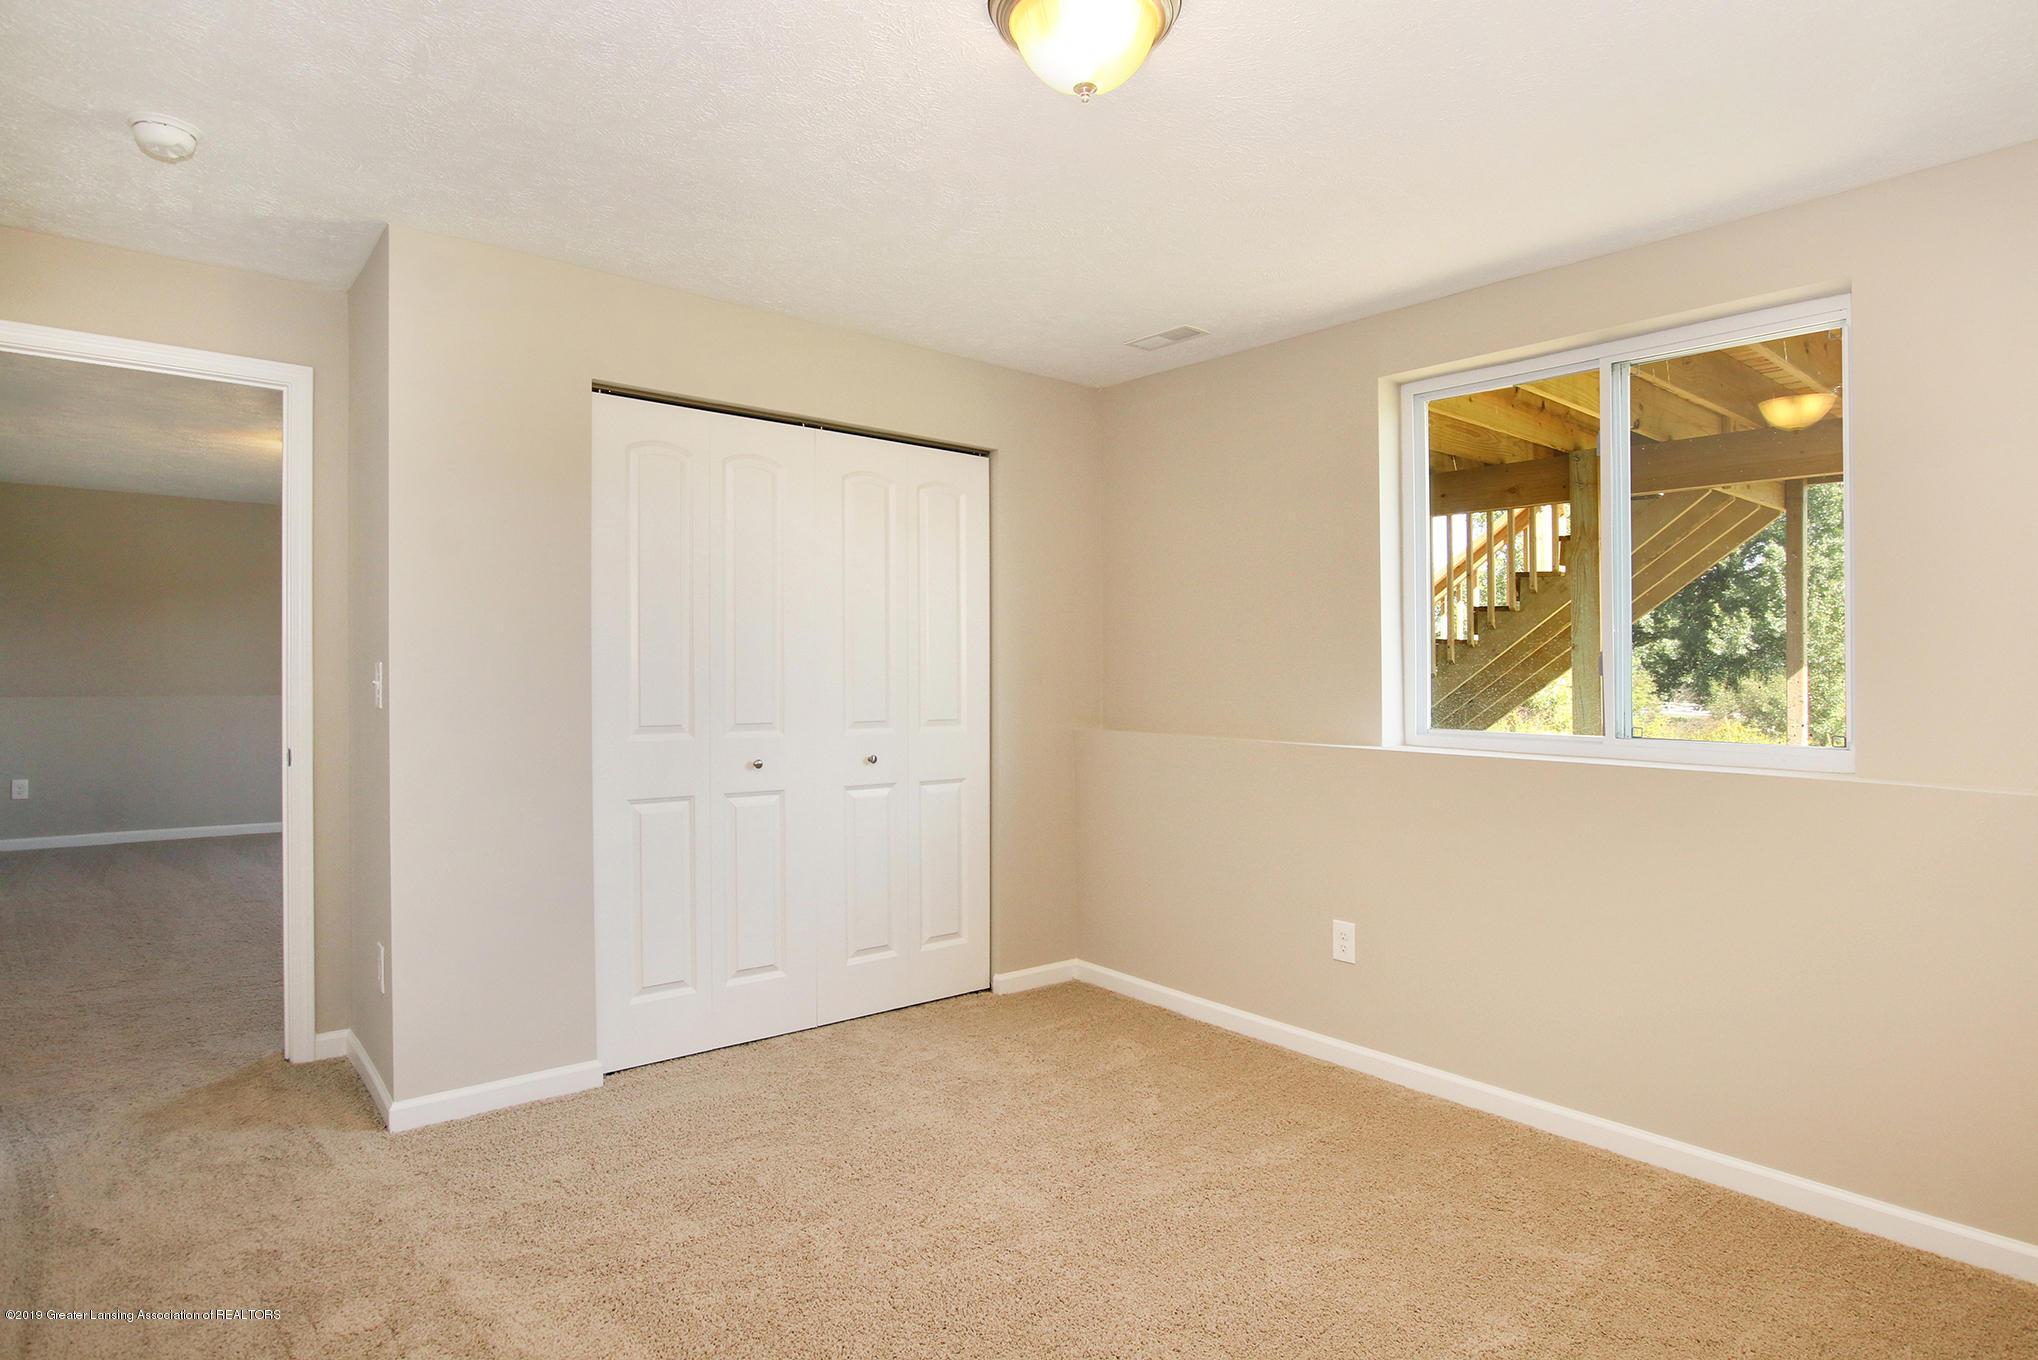 3524 Fernwood Ln - GDN067-C2040 Bedroom 2 - 15